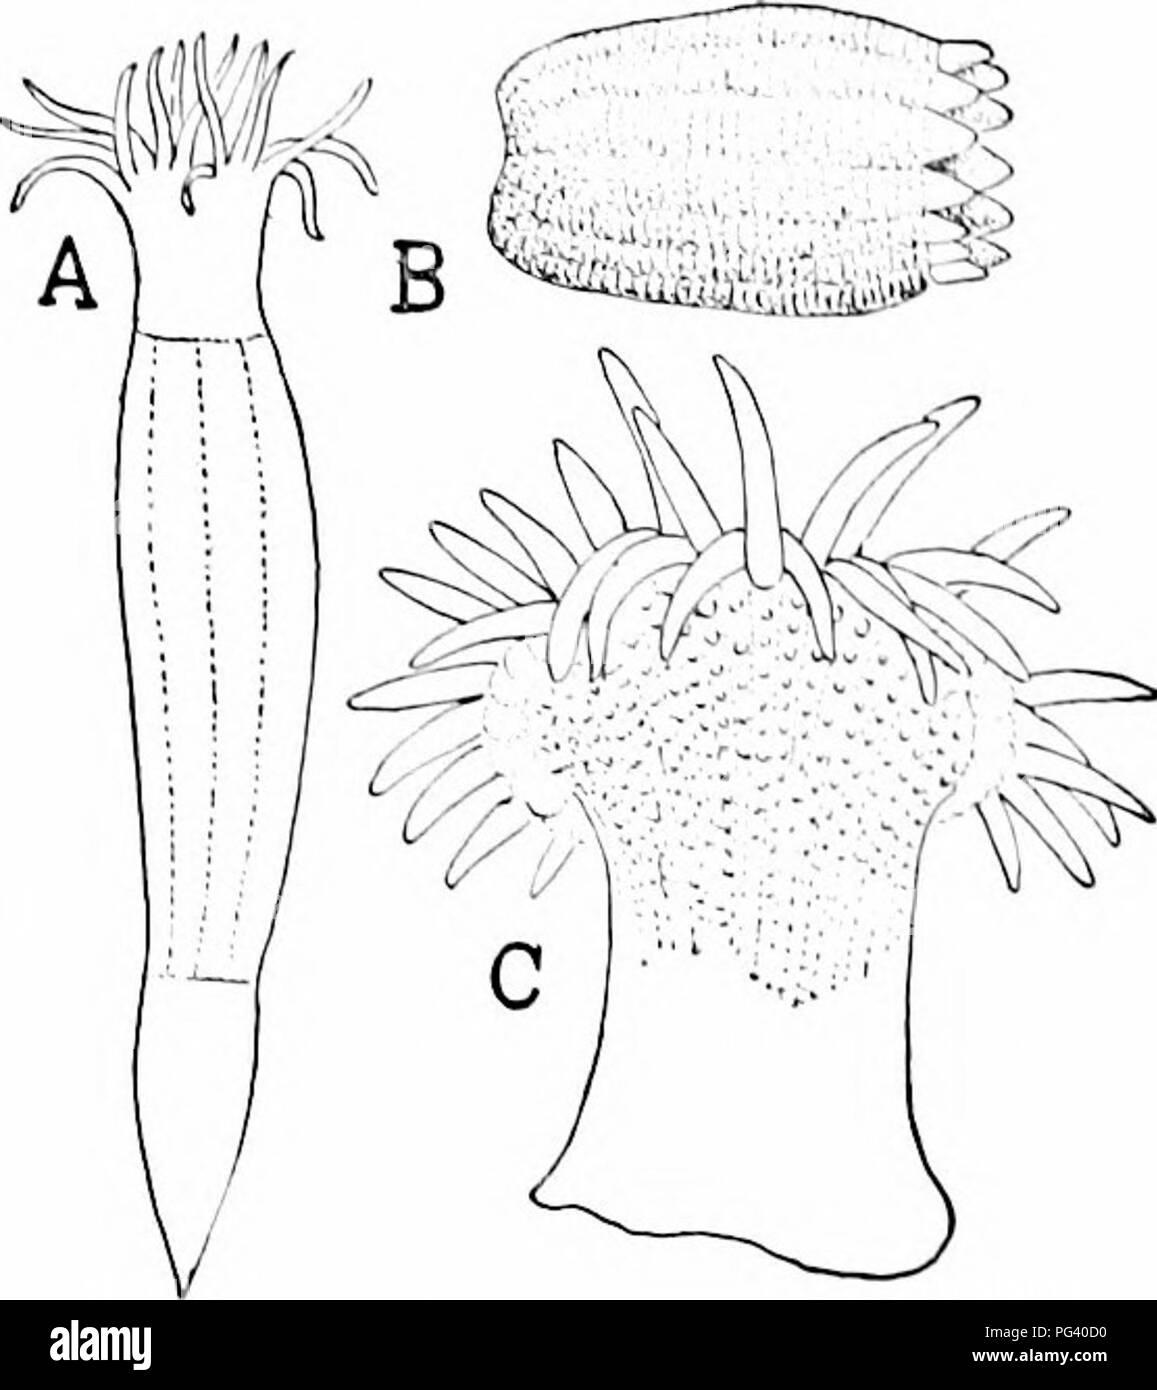 ". A manual of zoology. Zoology. Fig. 201. Fio. 202. Fio. 201.—Tlirce stages in development of Riitilla roiifonnis (after 'ilson). A, cleavage of egg; B, jilanula; C, deelopnient of a'sopliagus; cc, ectoderm; cti. ento- derm; /;/, nieso^L^lcTa; 0, a-soplia^^iis. l'""ic.. 202.—.Vmerican sea-aiieniones. .1, KtkvardsiclUi sipiiut-iiloiiJcs (after Slini]i- son). B, BiciJiiiiii parasiliiiiiii (after 'crrill). i', Biiinnhs slclla iafler XerrilO. .LrYONiiD.T; {Ah-youiuiii'''), axial skeleton is lacking, the llesh contains numerous calcareous particles (sitcrodcniiilfi). The sea pens, rtcNX.-V - Stock Image"